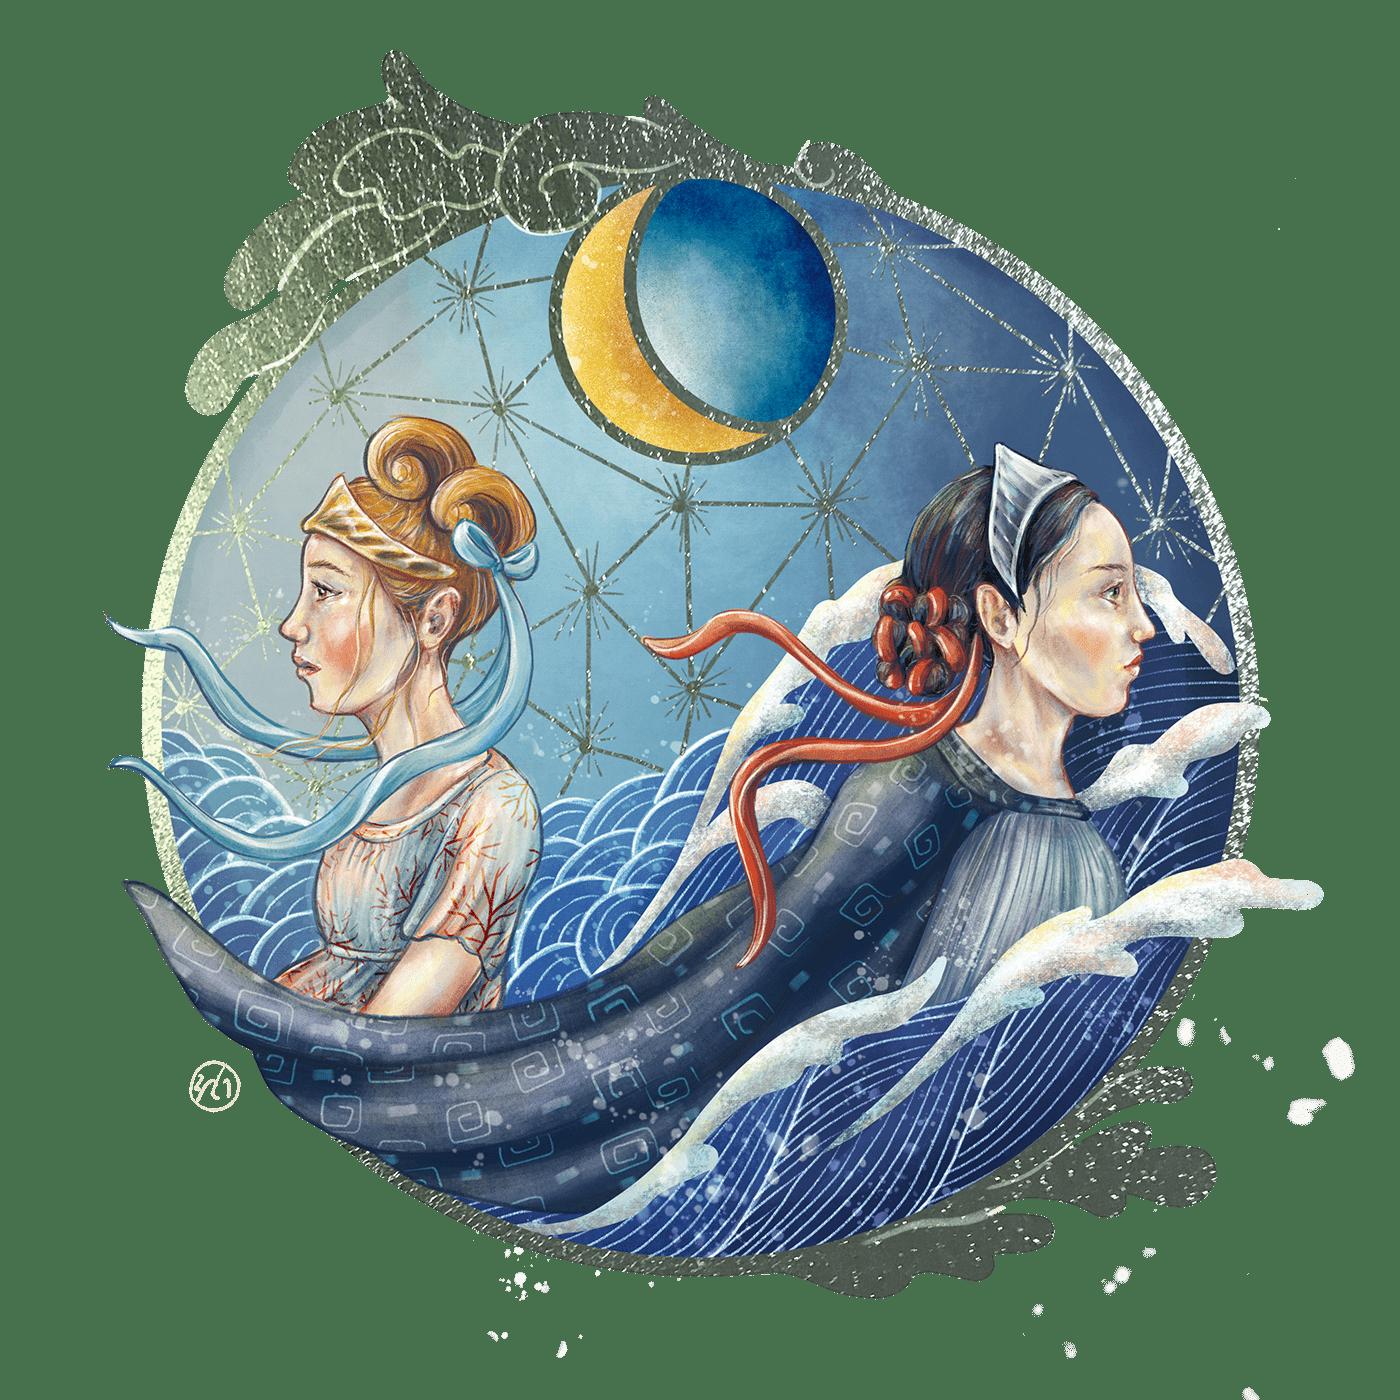 ebb fairytale fantasy flood mermaid mermay Ocean sea spirit tide